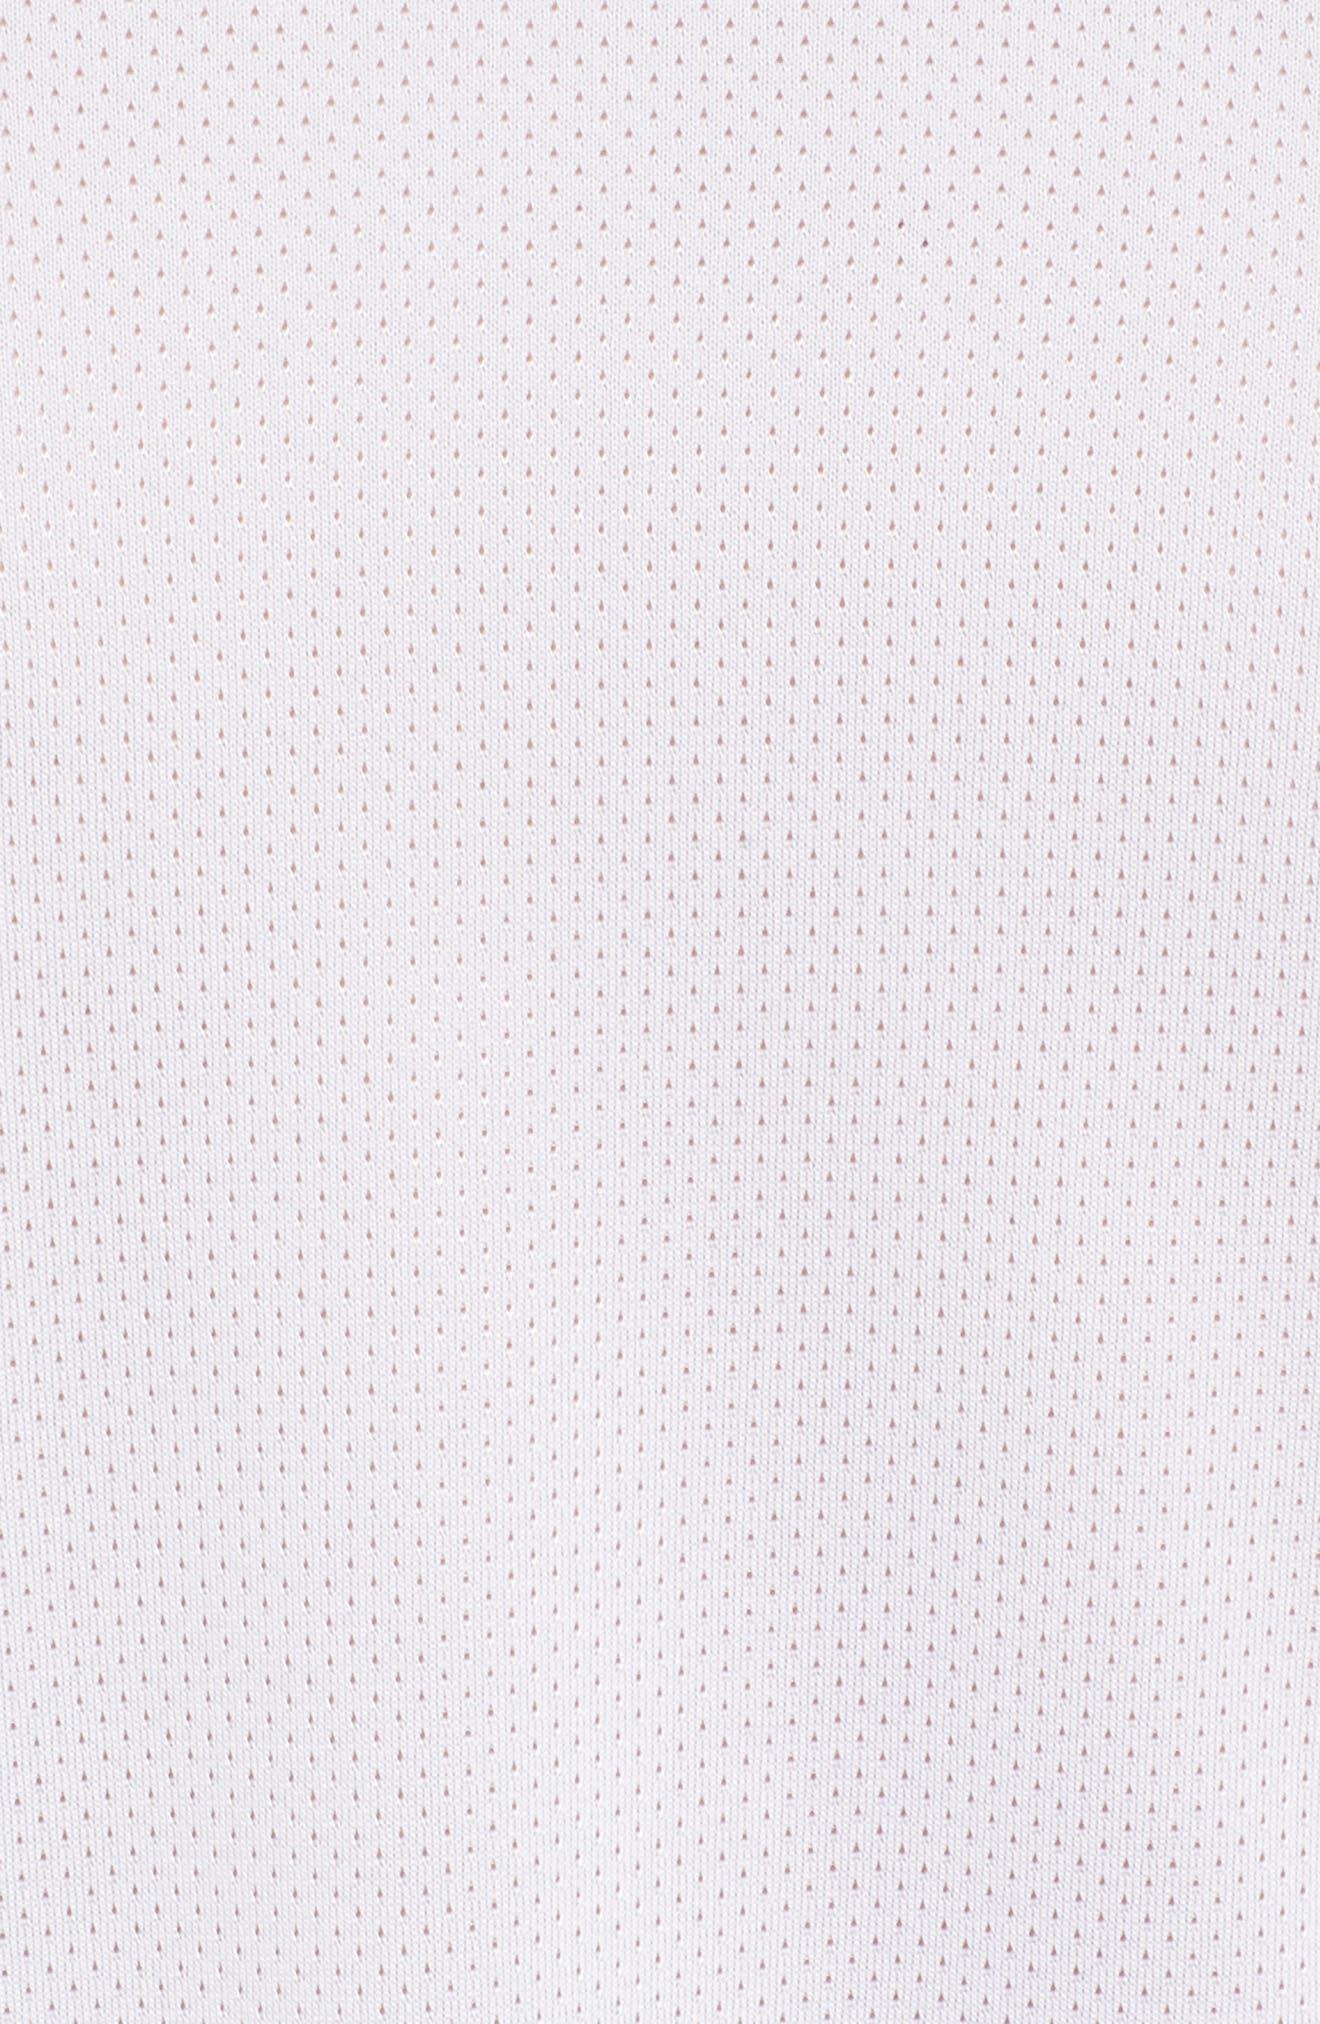 MK1 Dash Print Crewneck T-Shirt,                             Alternate thumbnail 5, color,                             WHITE / ZINC GREH / GRAPHITE